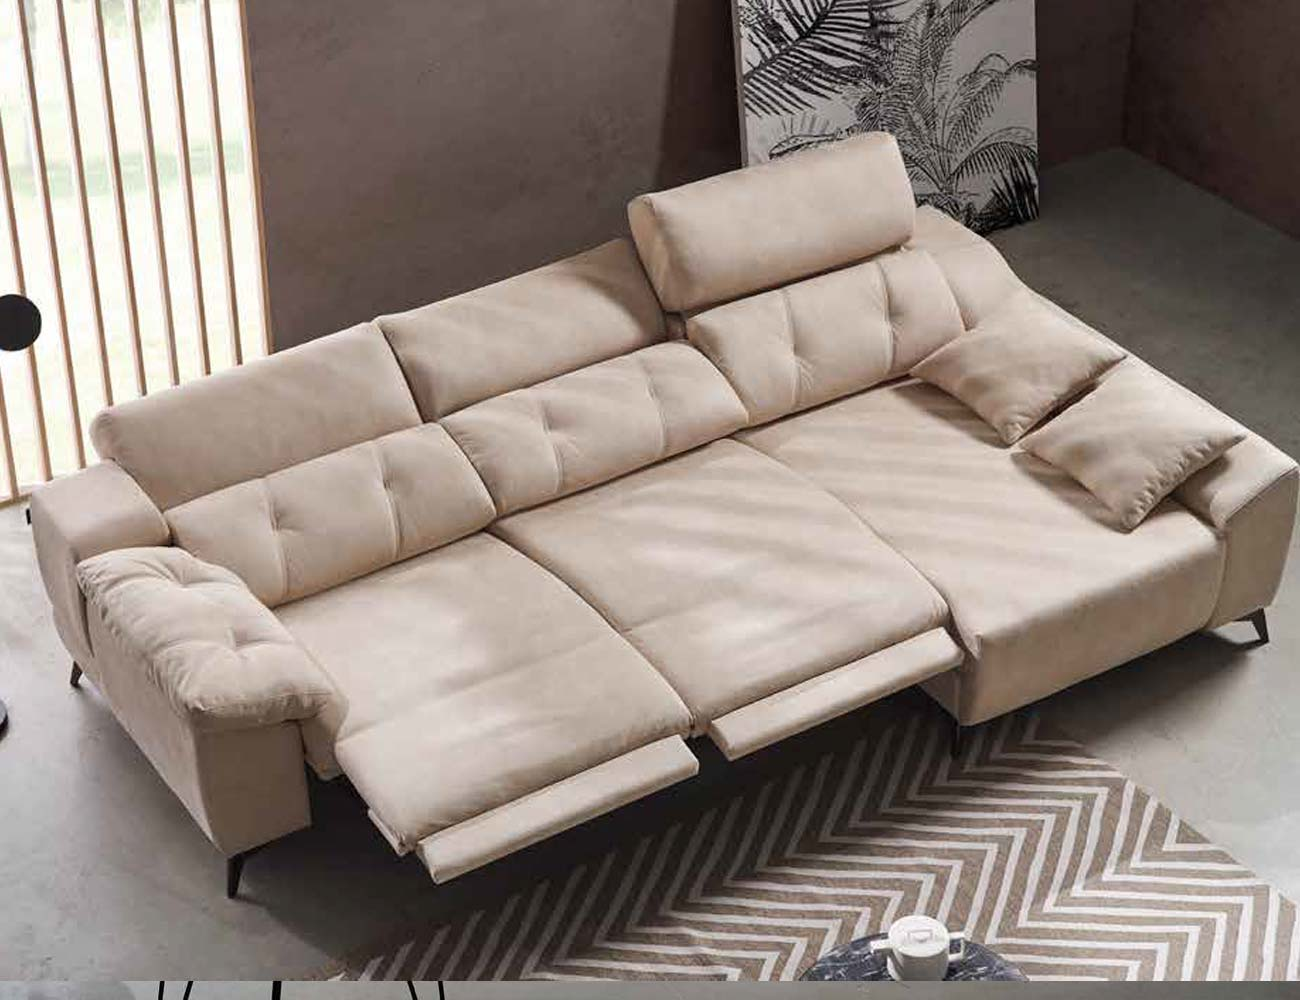 Sofa onix acomodel 2